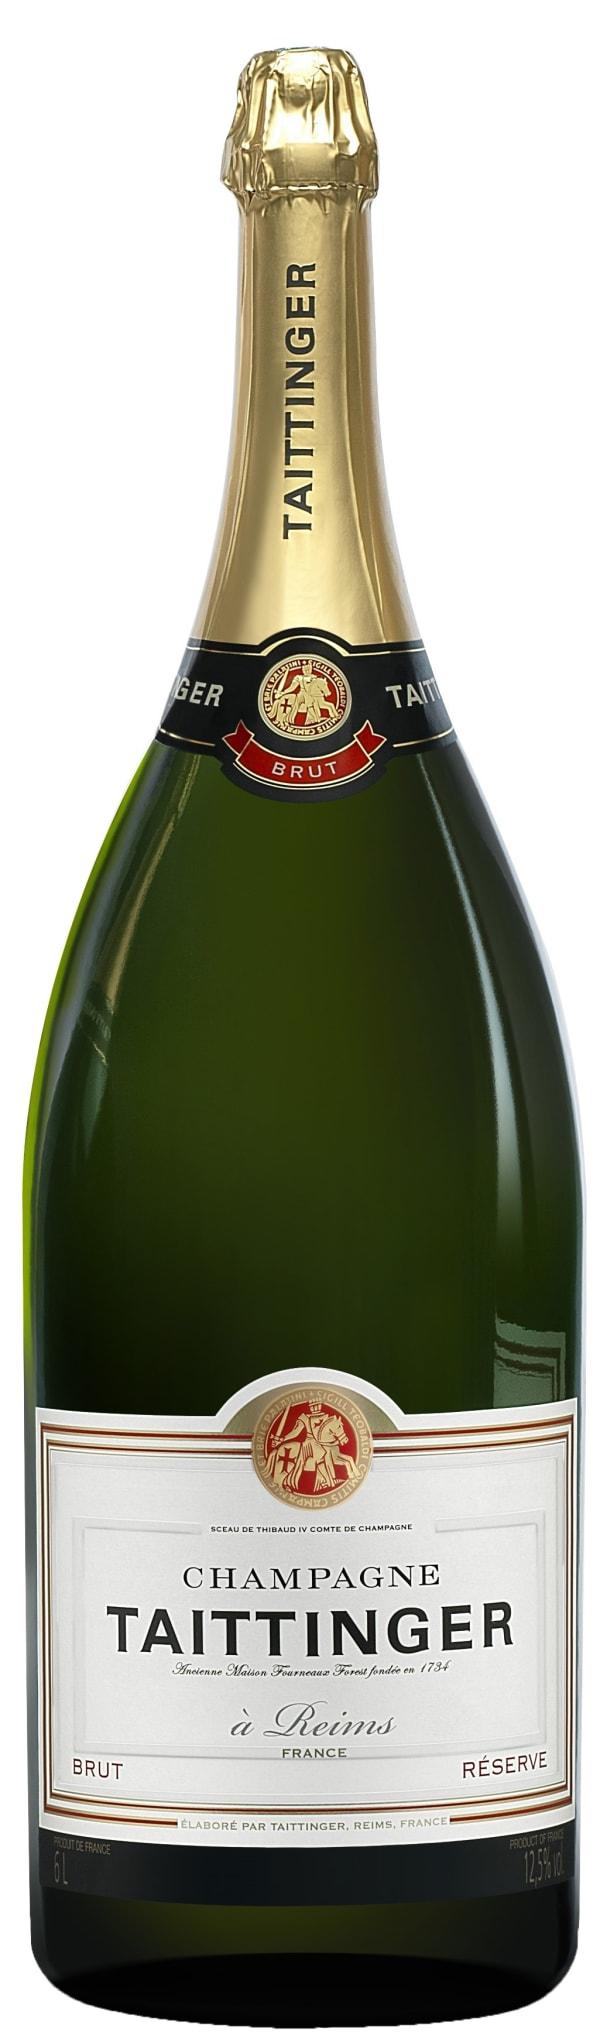 Taittinger Réserve Champagne Brut, Metuselah